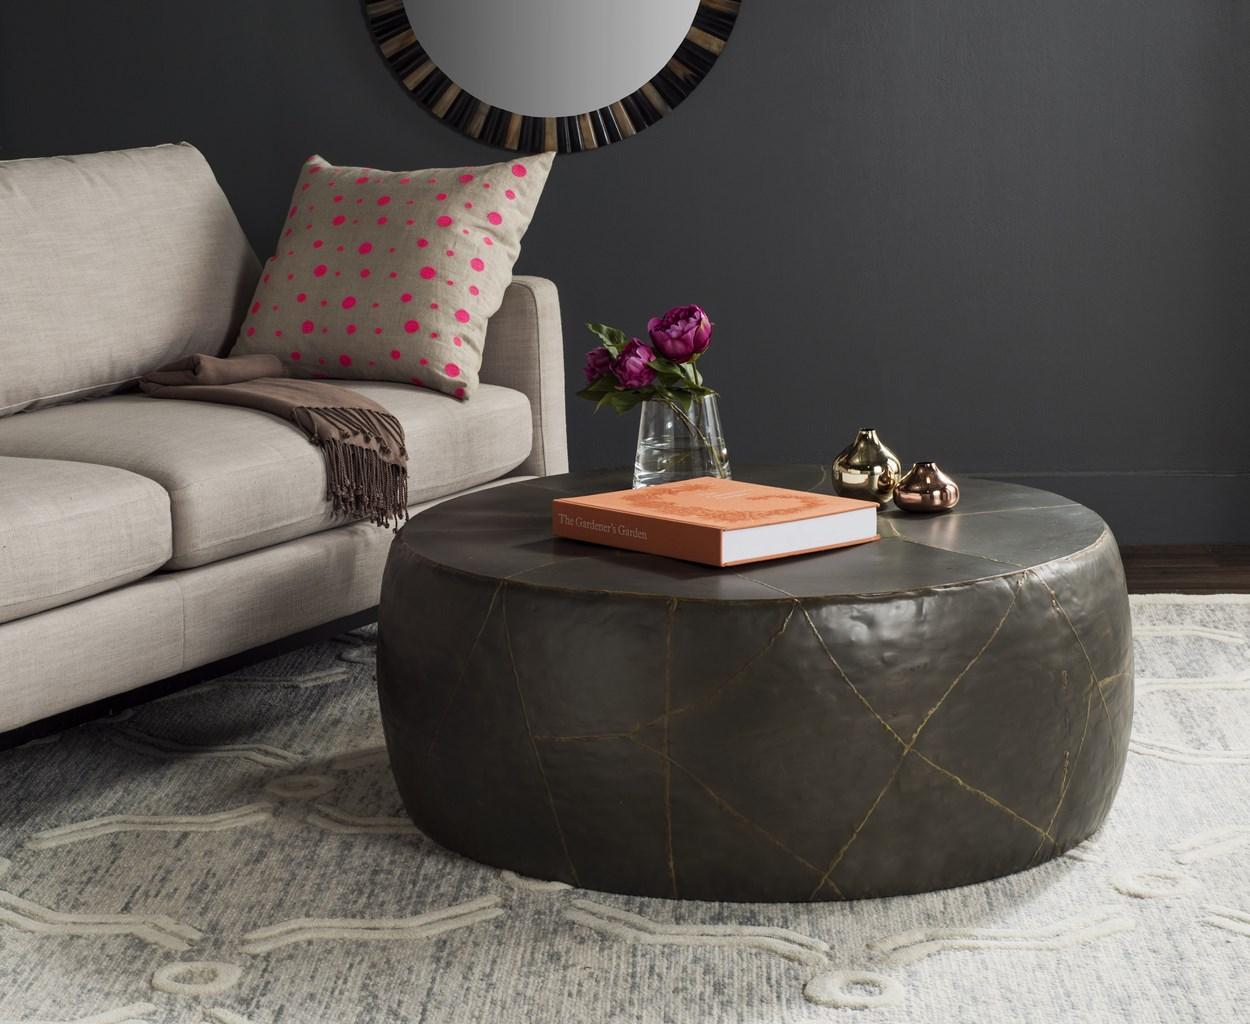 Vernice Coffee Table - Silver - Arlo Home